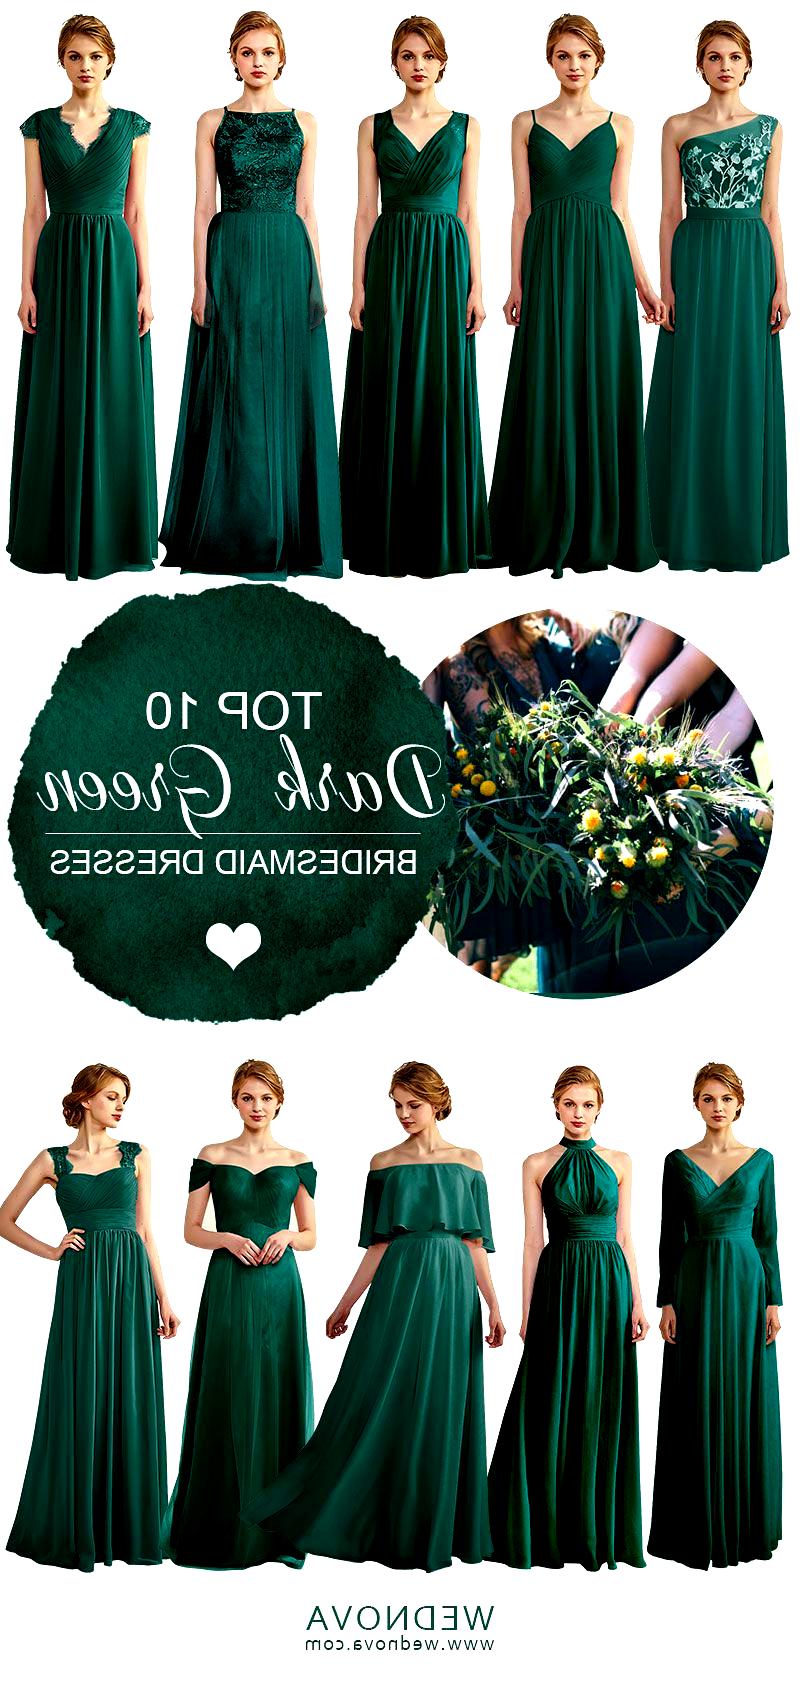 Dark Green Chiffon Bridesmaid Dress High Quality Halter Dress V Neck Dress With In 2020 Dark Green Bridesmaid Dress Green Bridesmaid Dresses Summer Bridesmaid Dresses